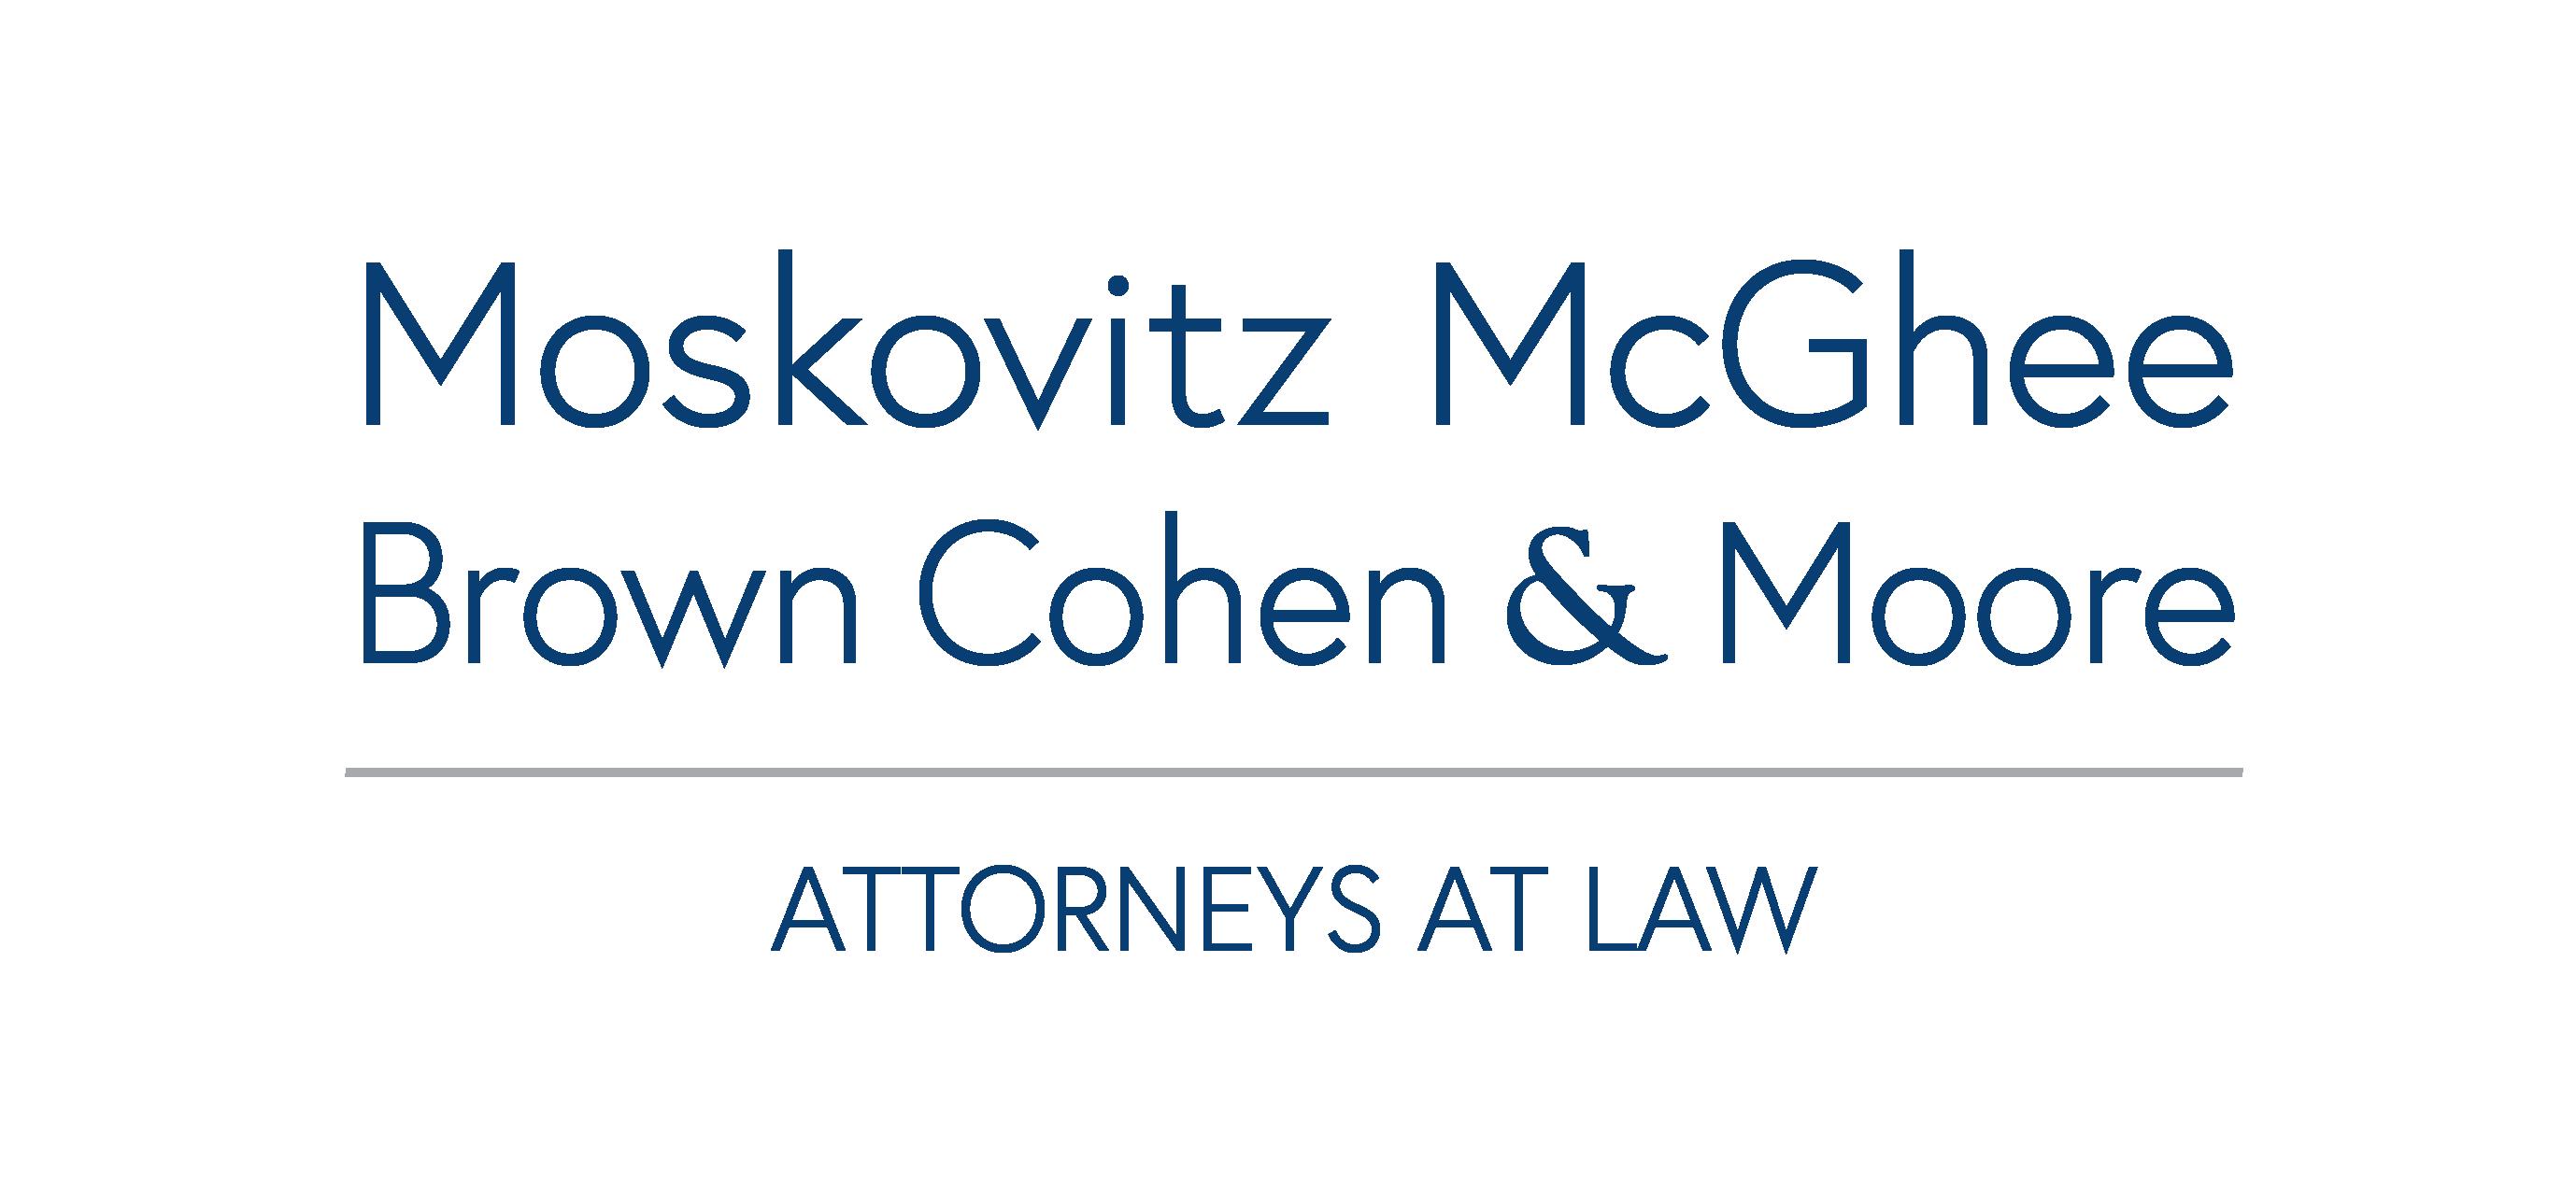 Shea, Moskovitz, & McGhee Logo